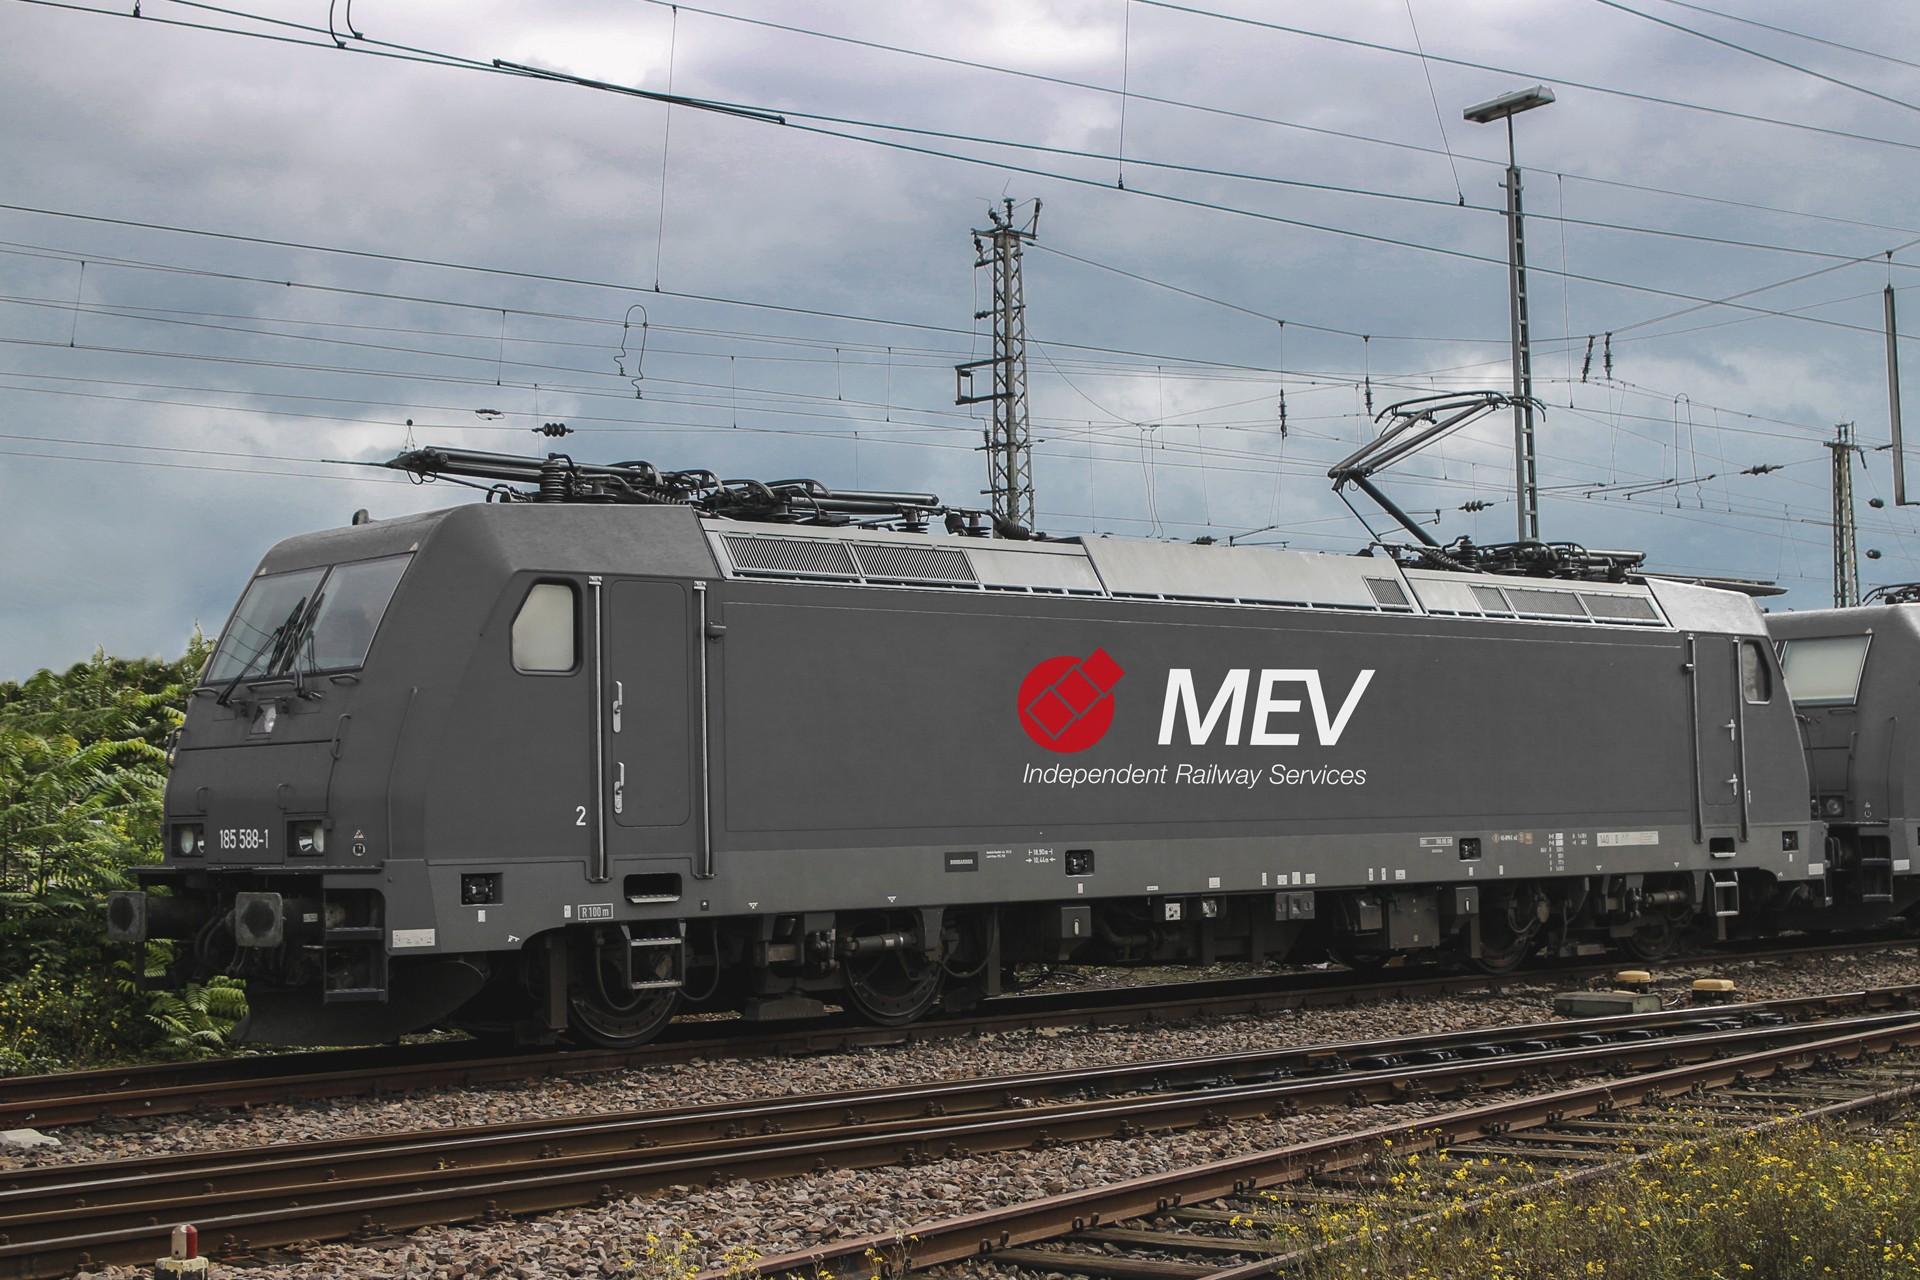 Kết quả hình ảnh cho Fahren Sie den Mev-Zug